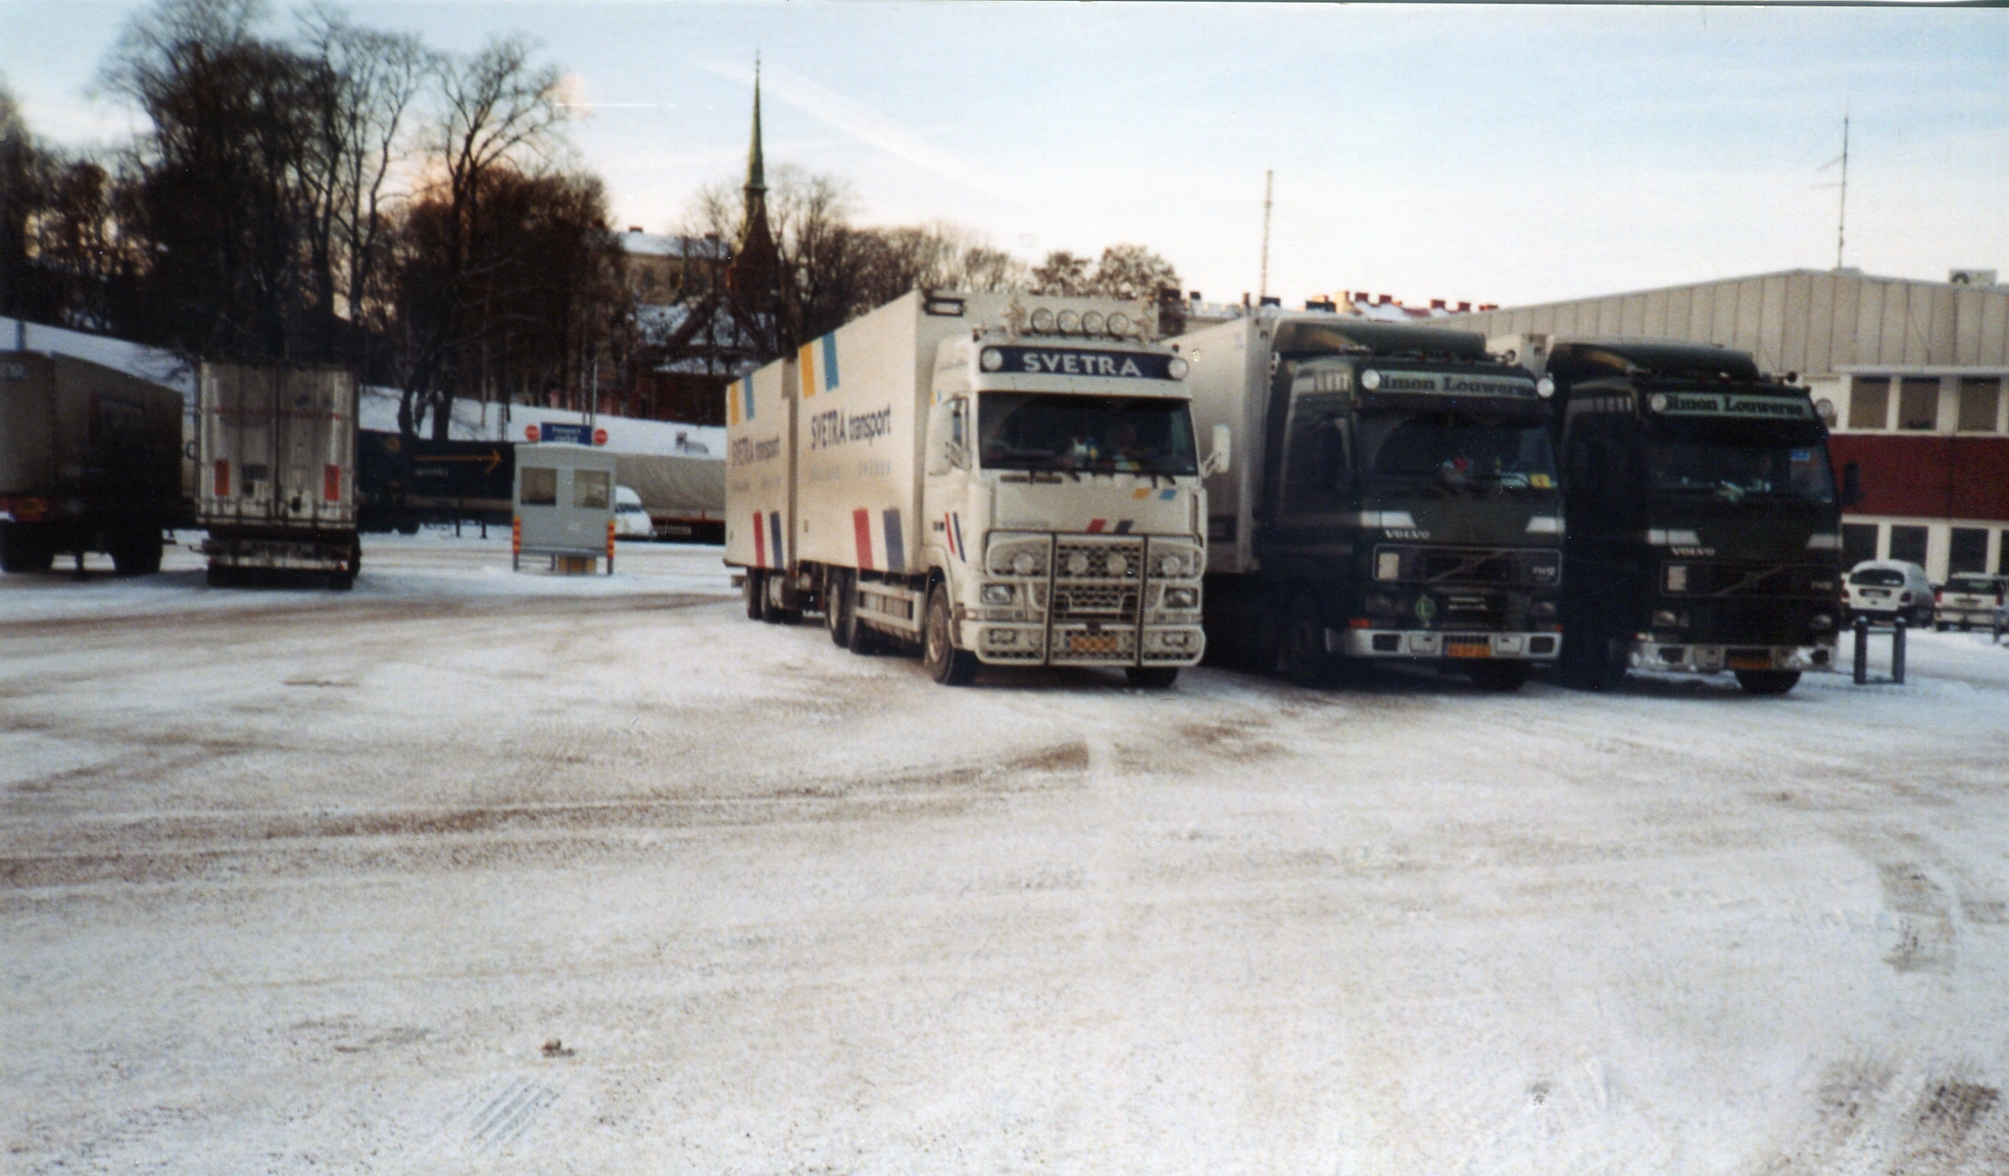 C-Spanje-Finland-5